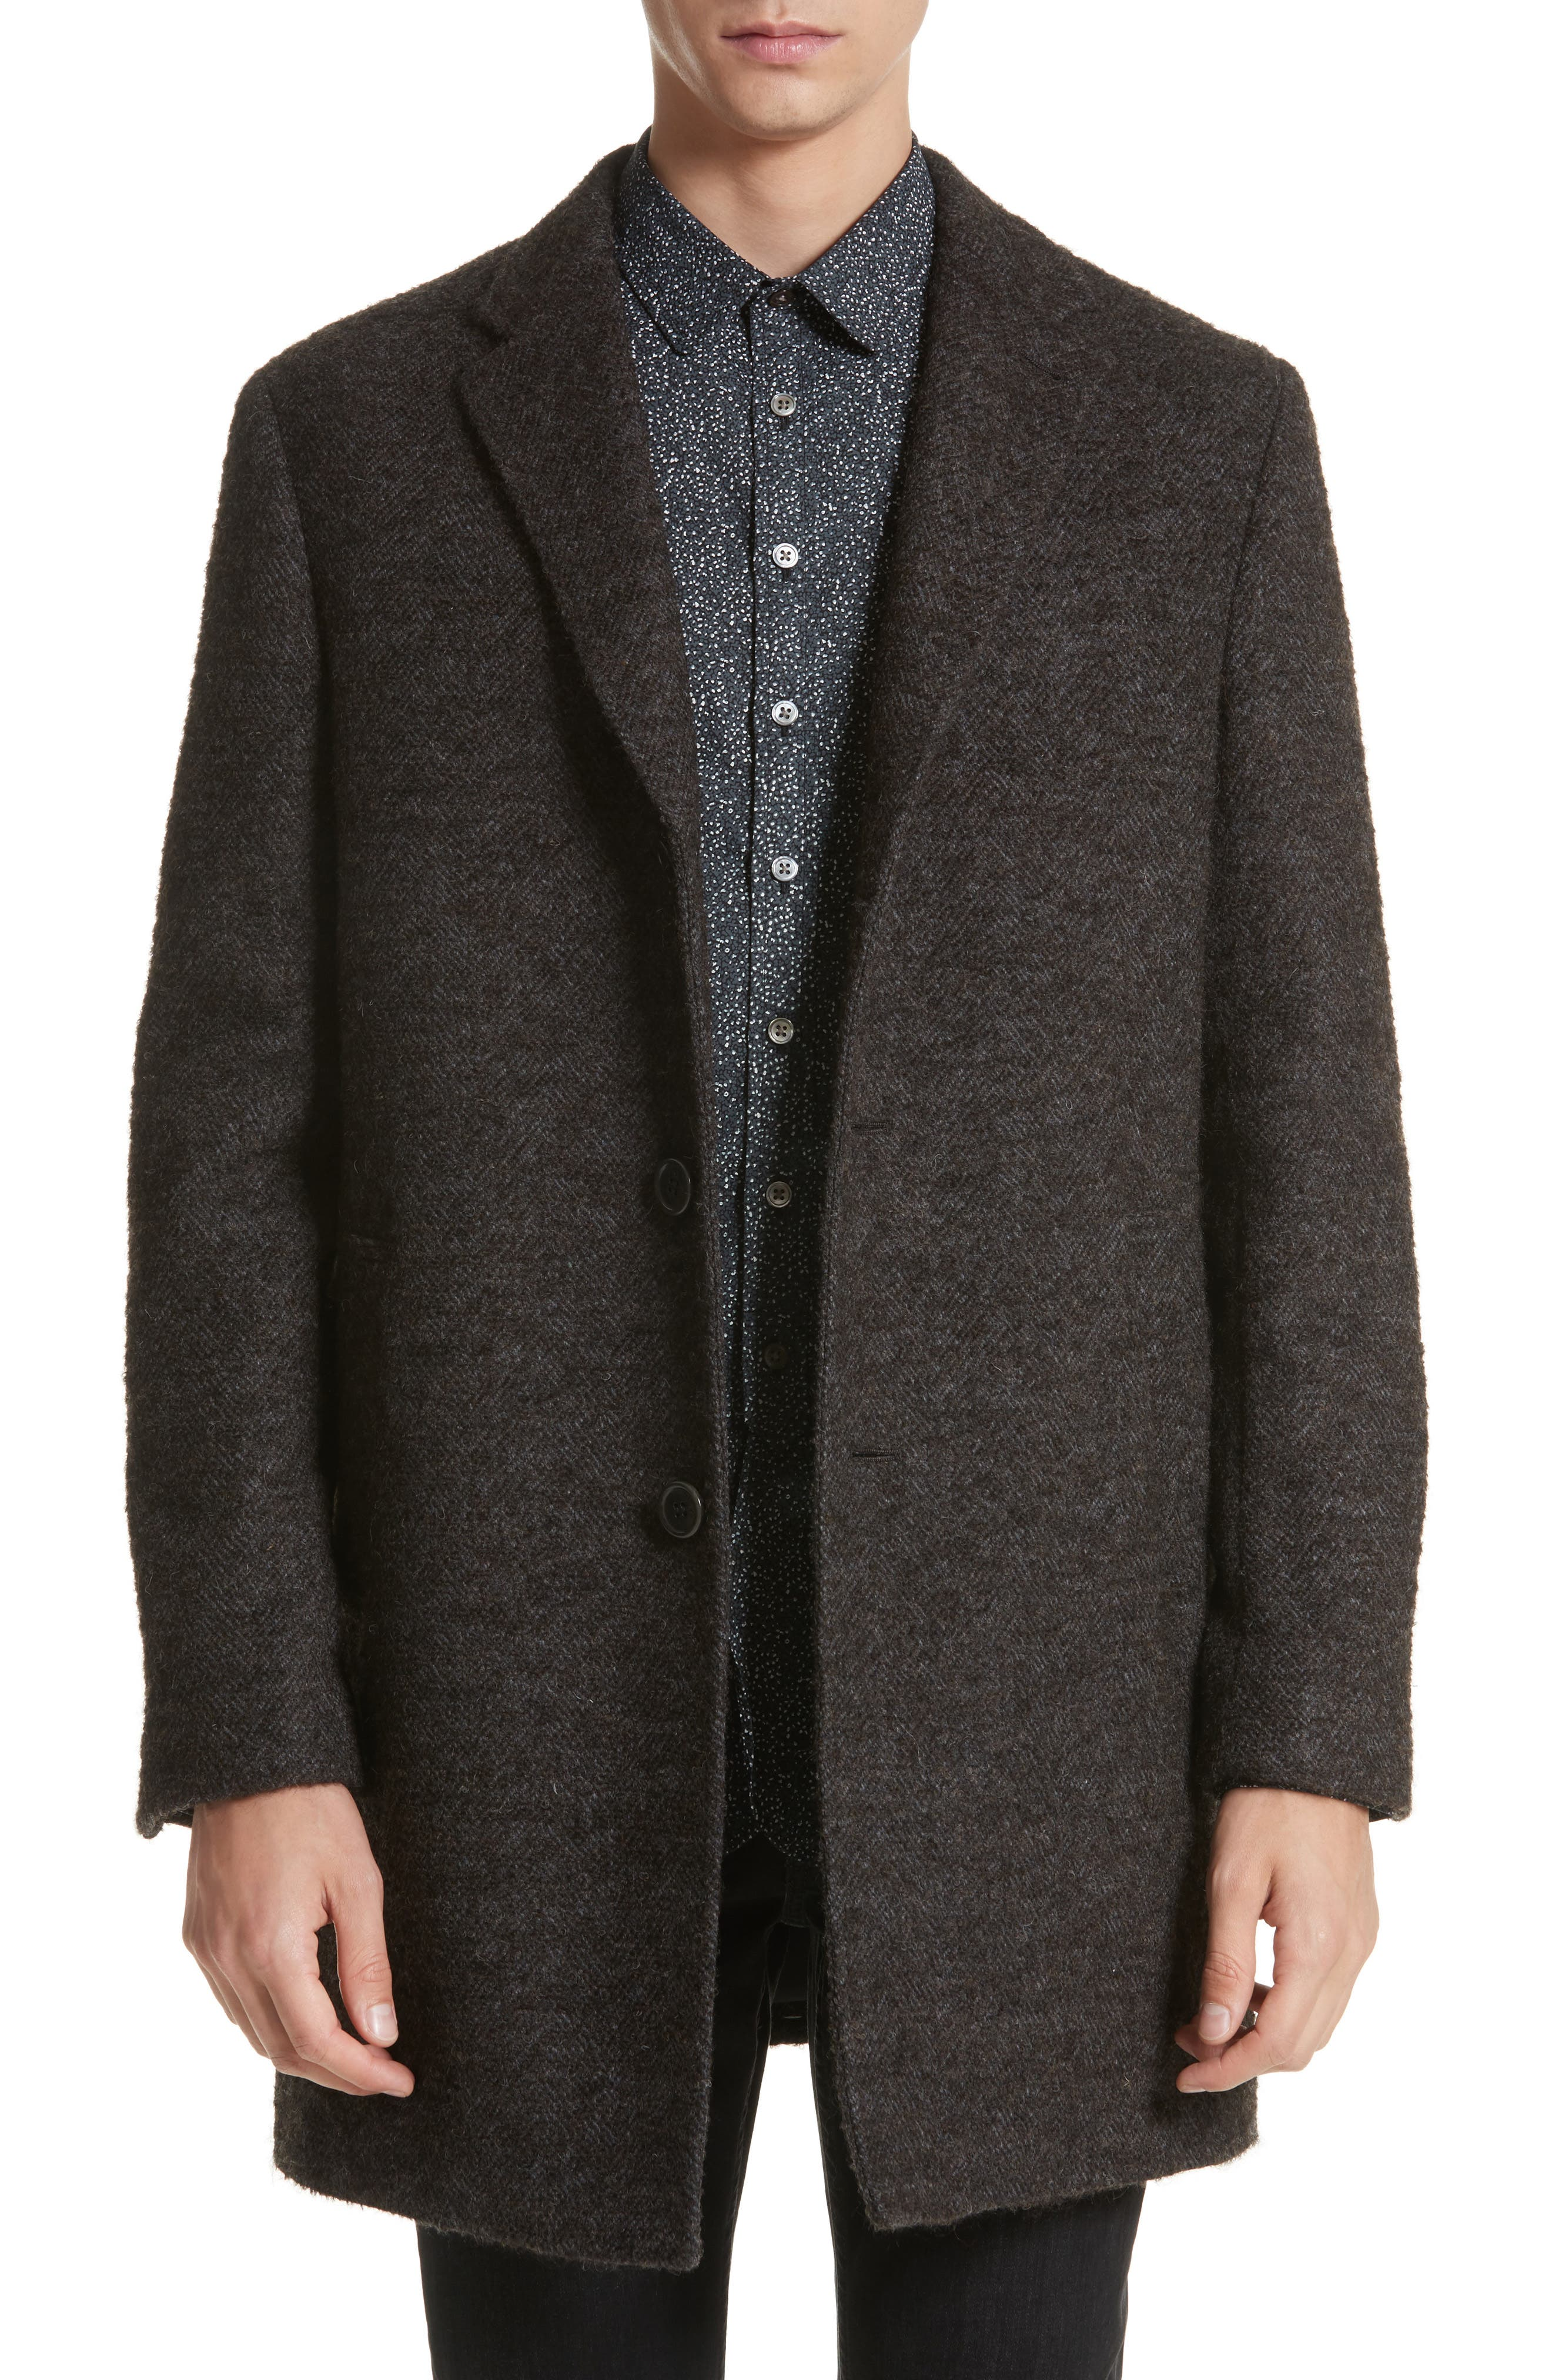 Walsh Wool Blend Topcoat,                             Main thumbnail 1, color,                             Brown/ White